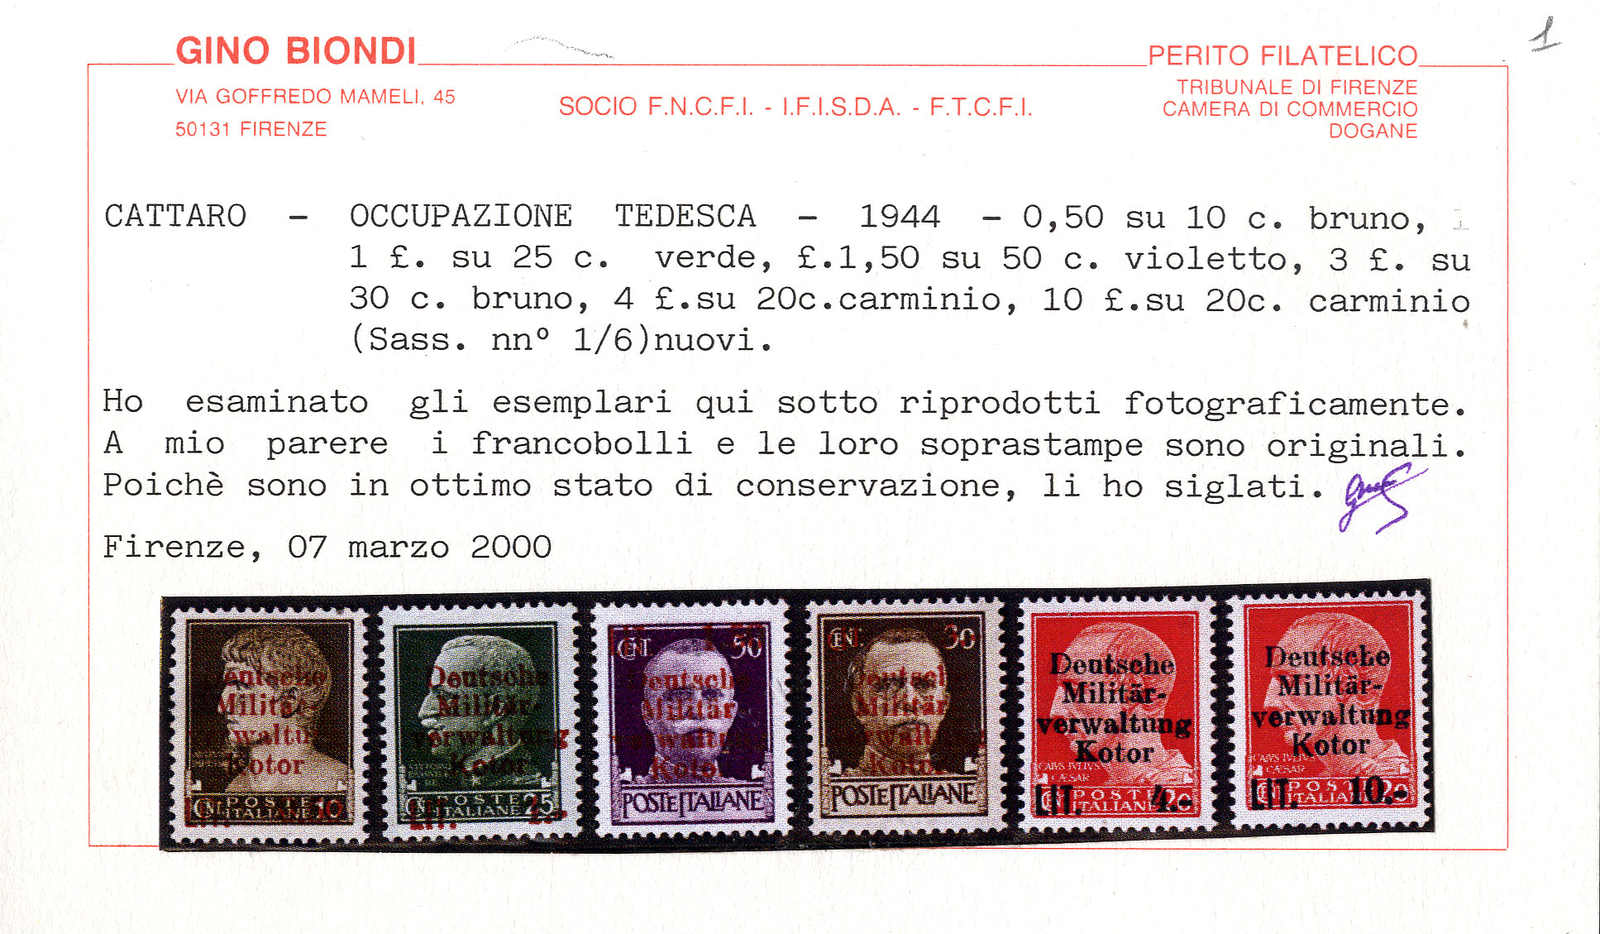 Lot 3052 - germany German Occupation II. Worldwar Kotor -  Viennafil Auktionen 63rd LIVE AUCTION